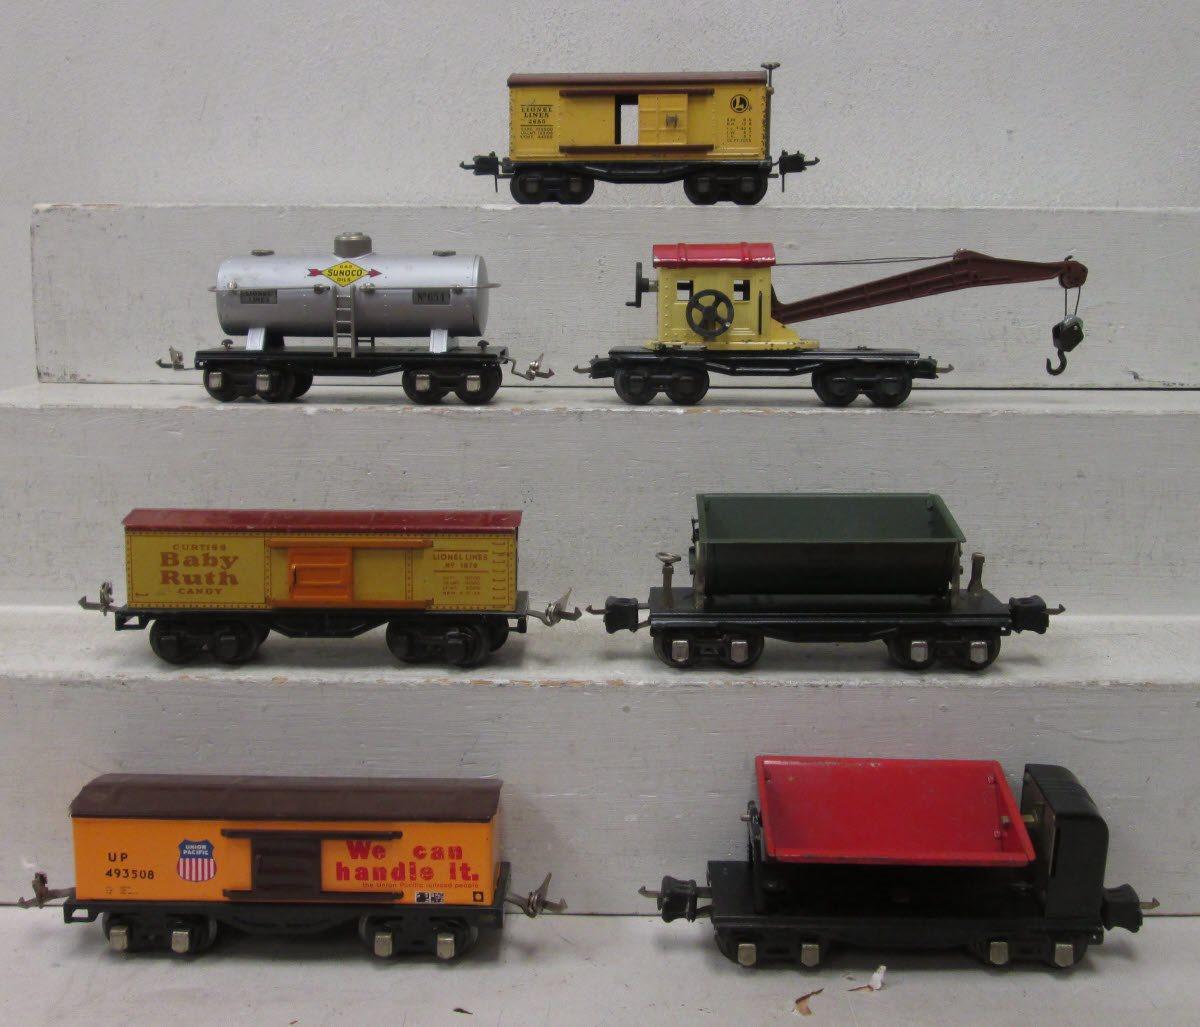 Lionel O Gauge Assorted Prewar Freight Cars: 2655, 1679